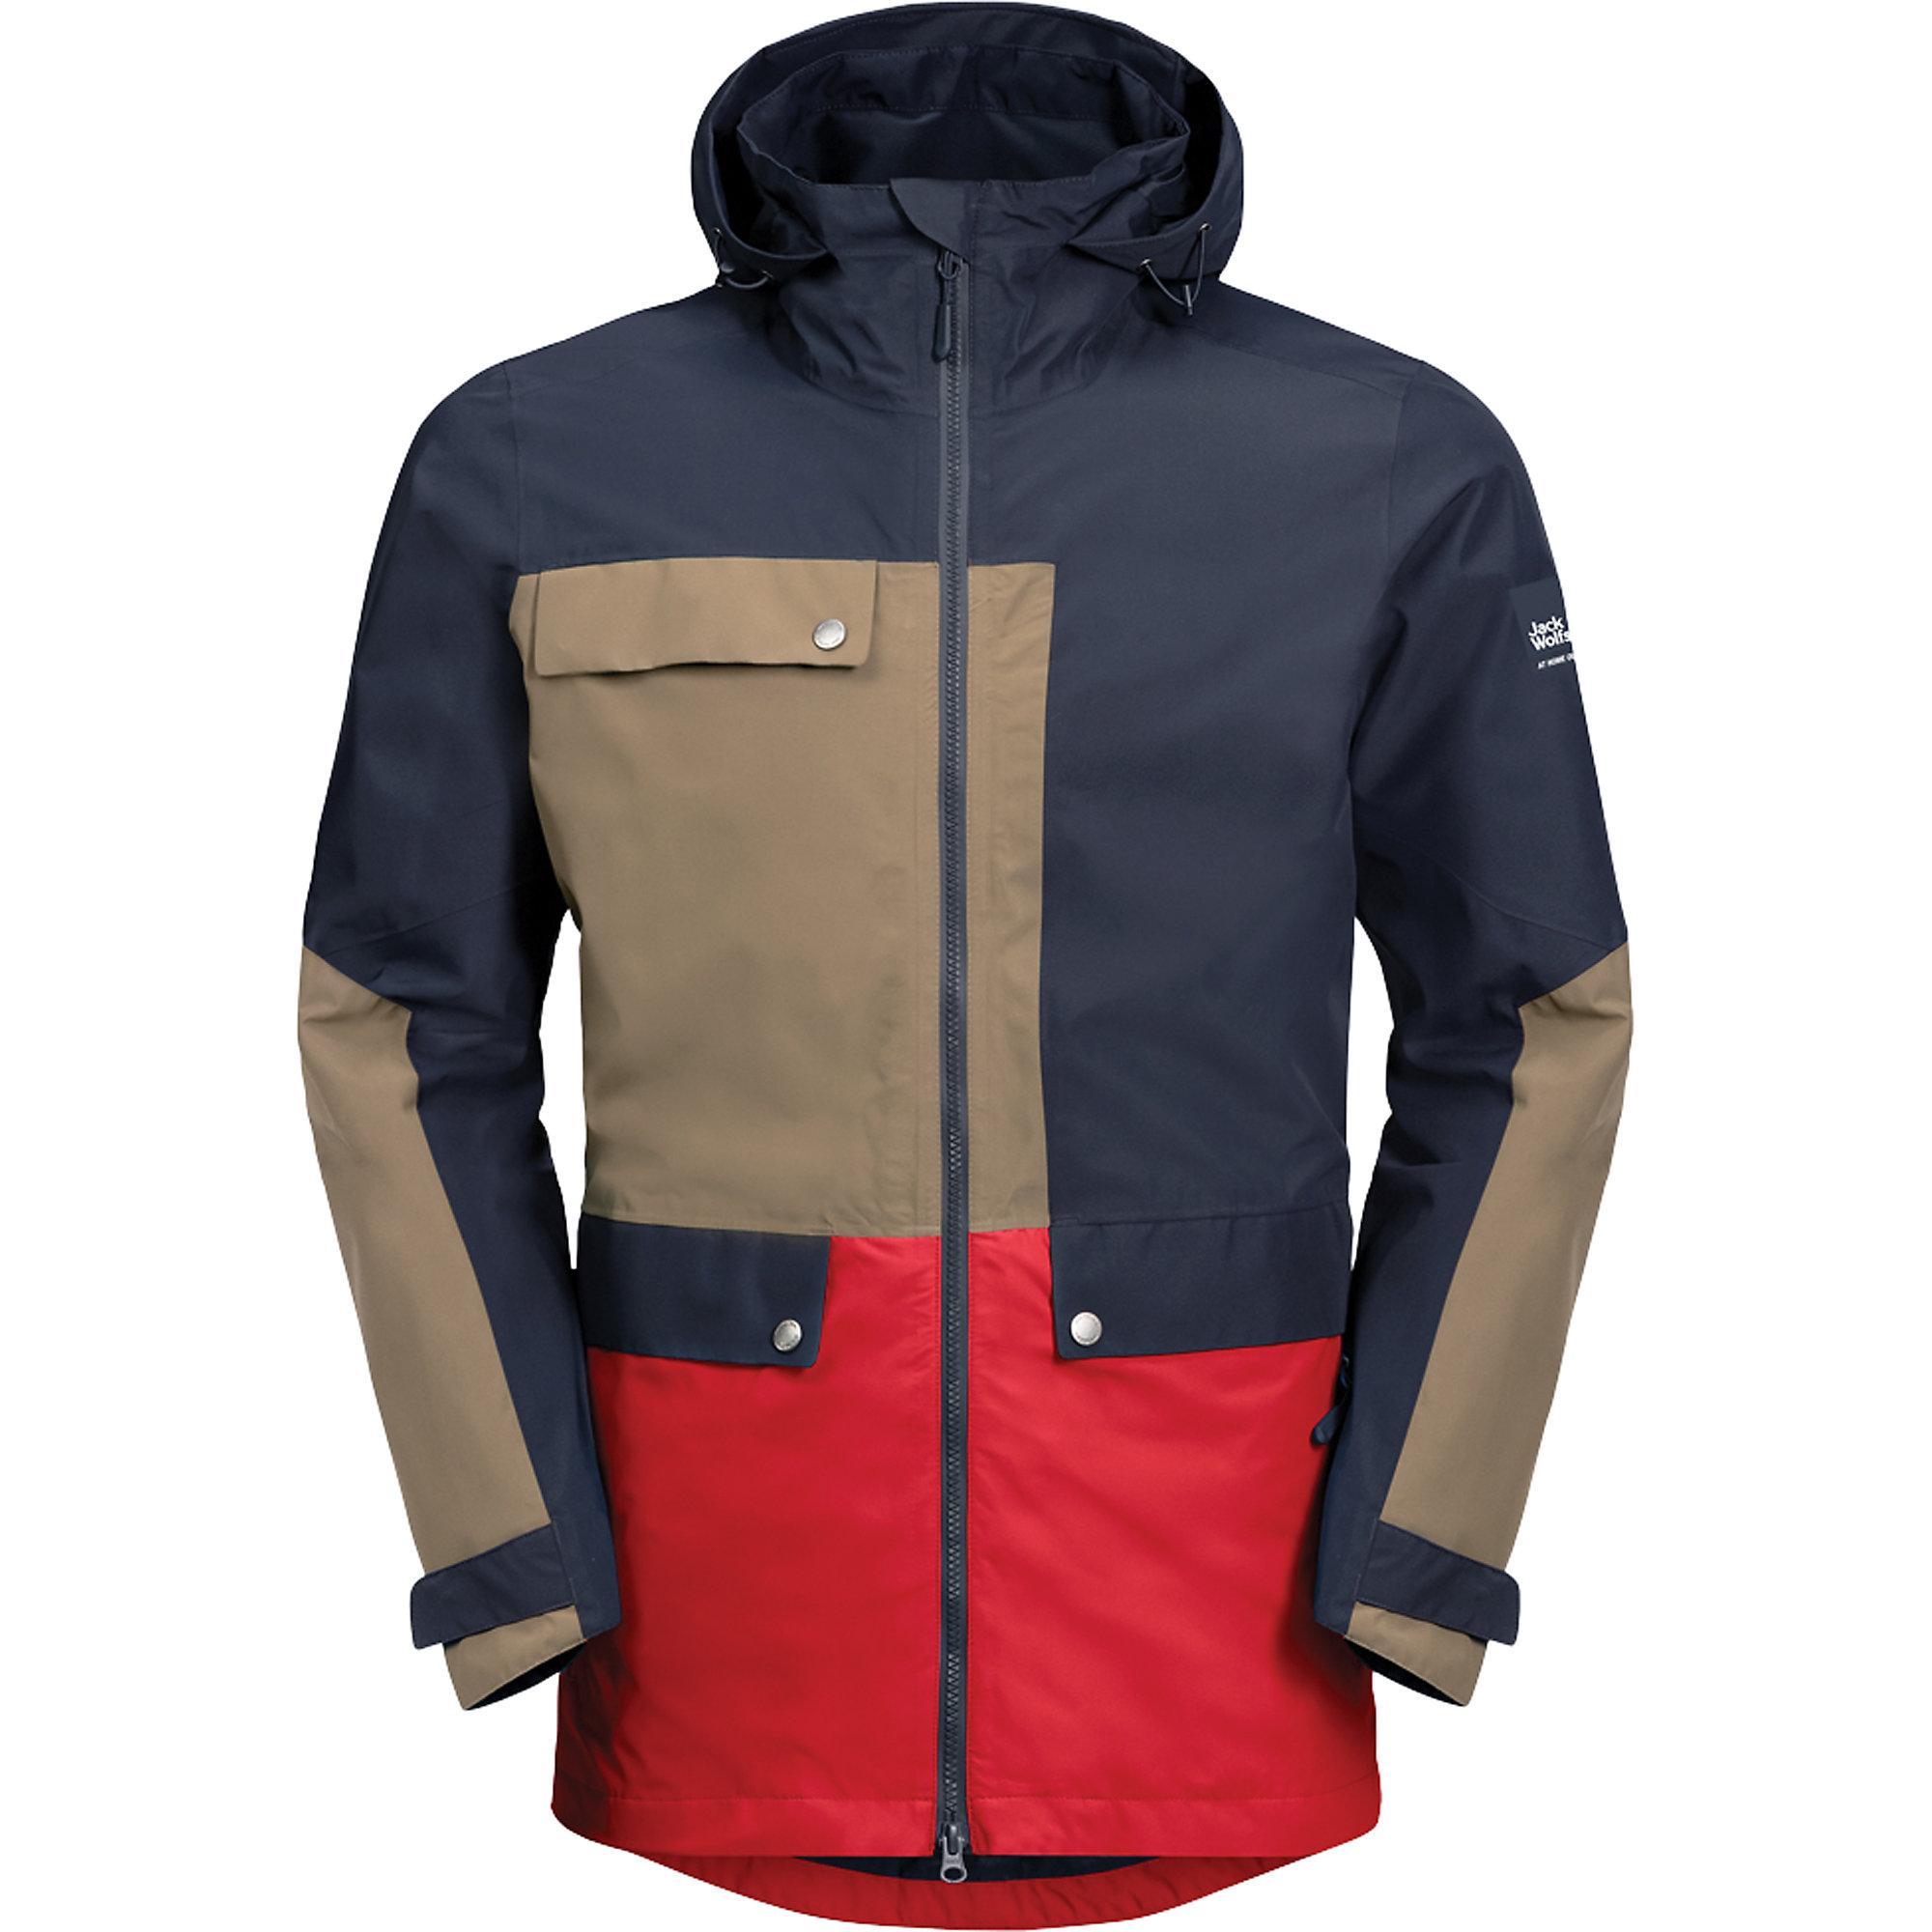 be58702b6b Jack Wolfskin 365 Influencer Jacket in Blue for Men - Save 35% - Lyst